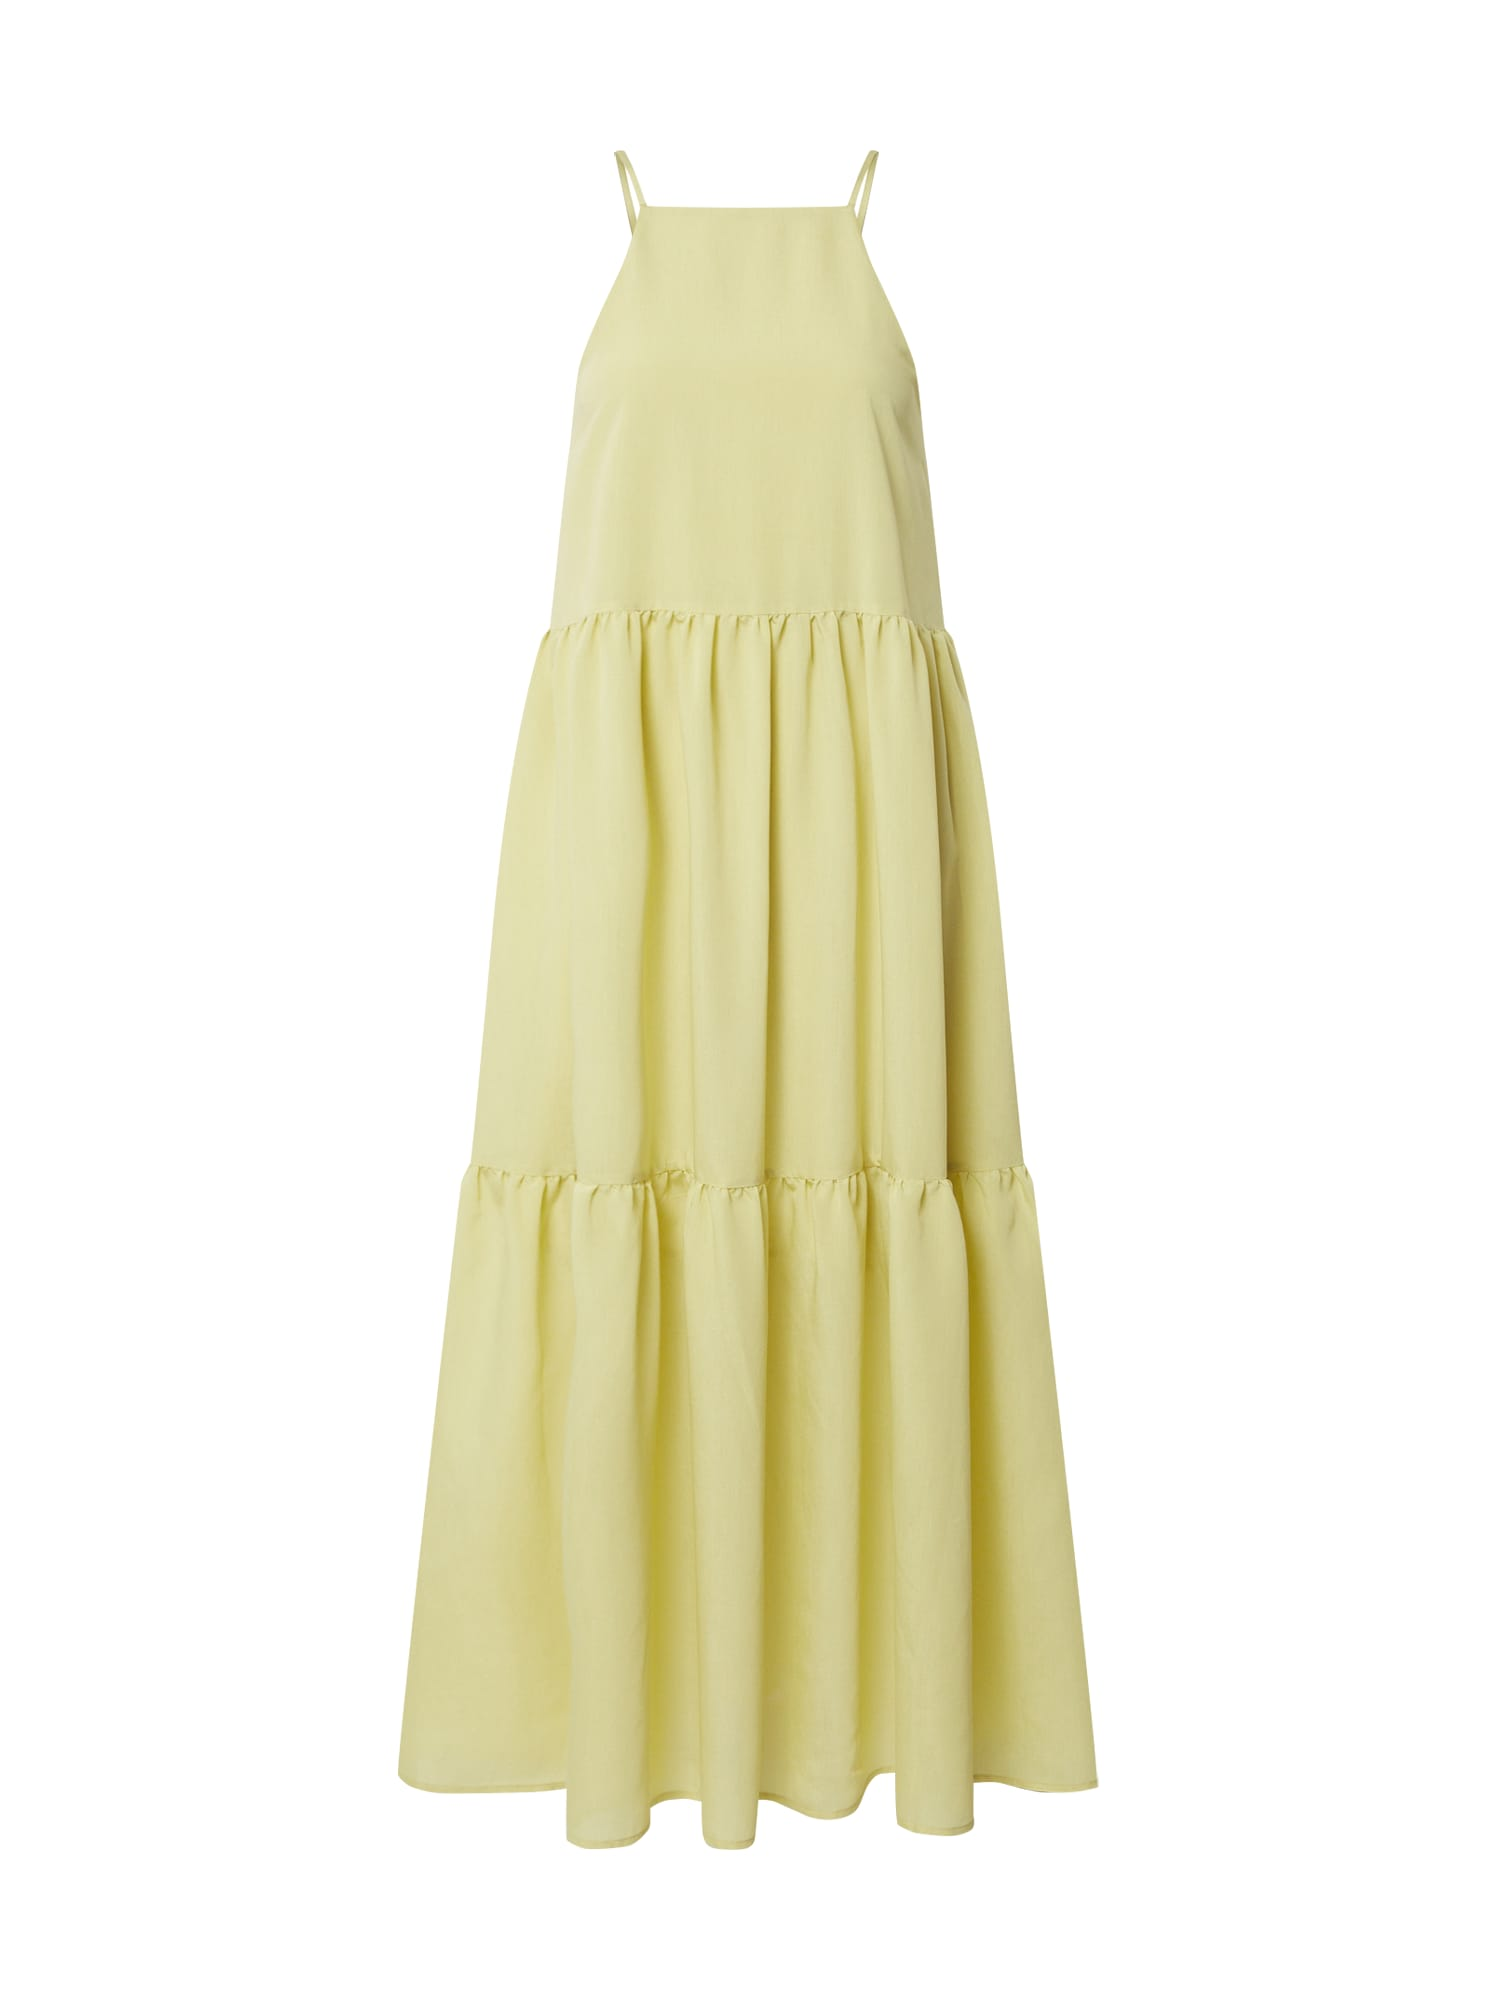 EDITED Suknelė 'Inka' žalia